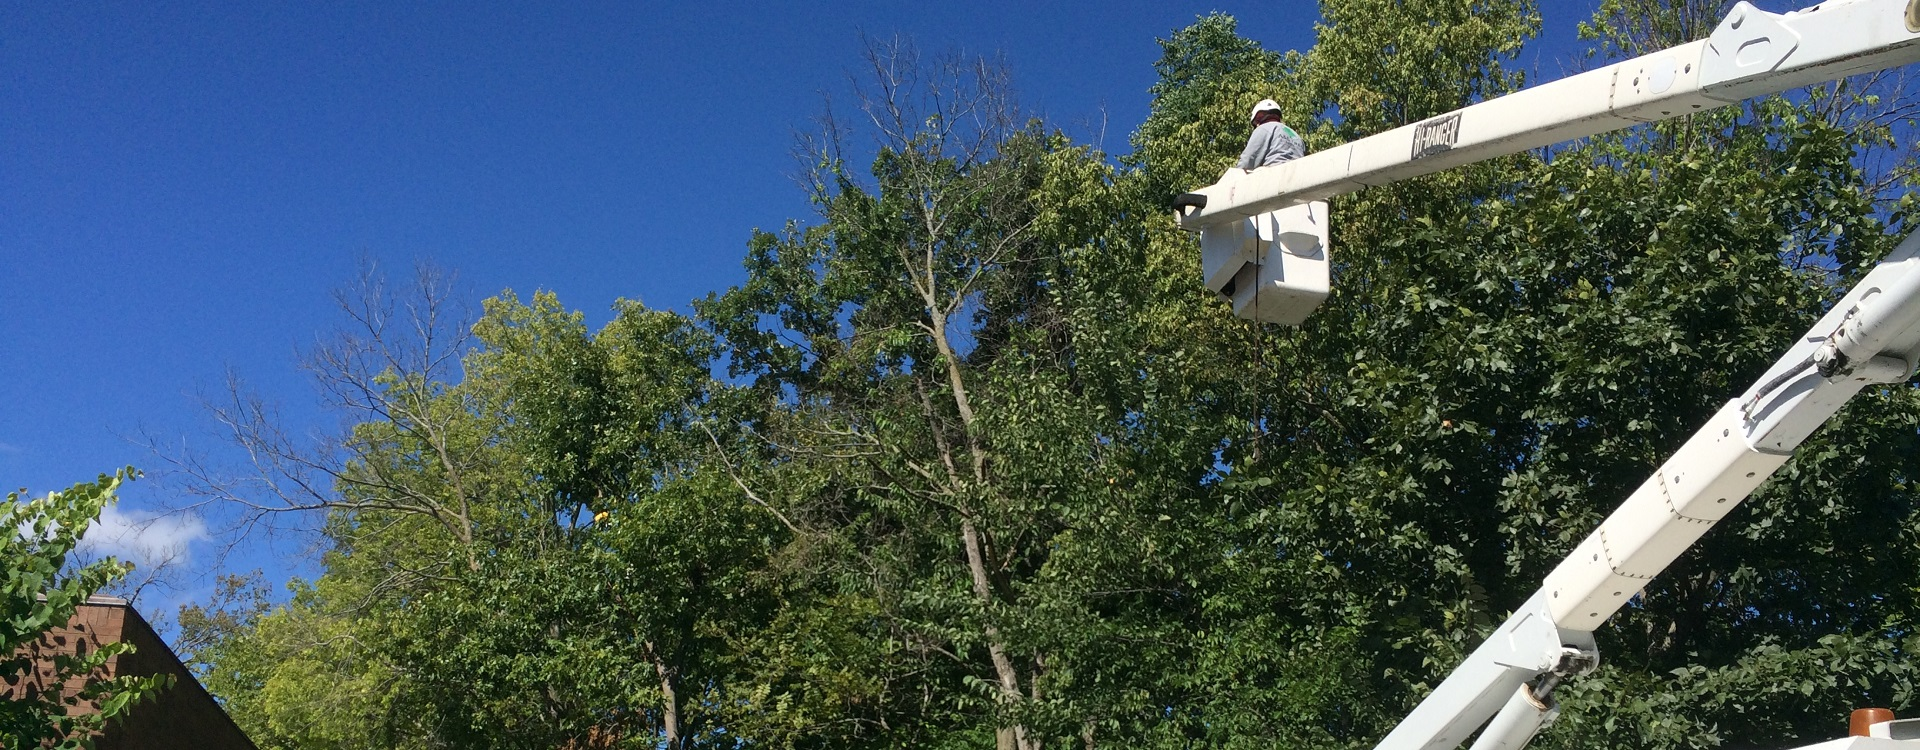 tree service contractors